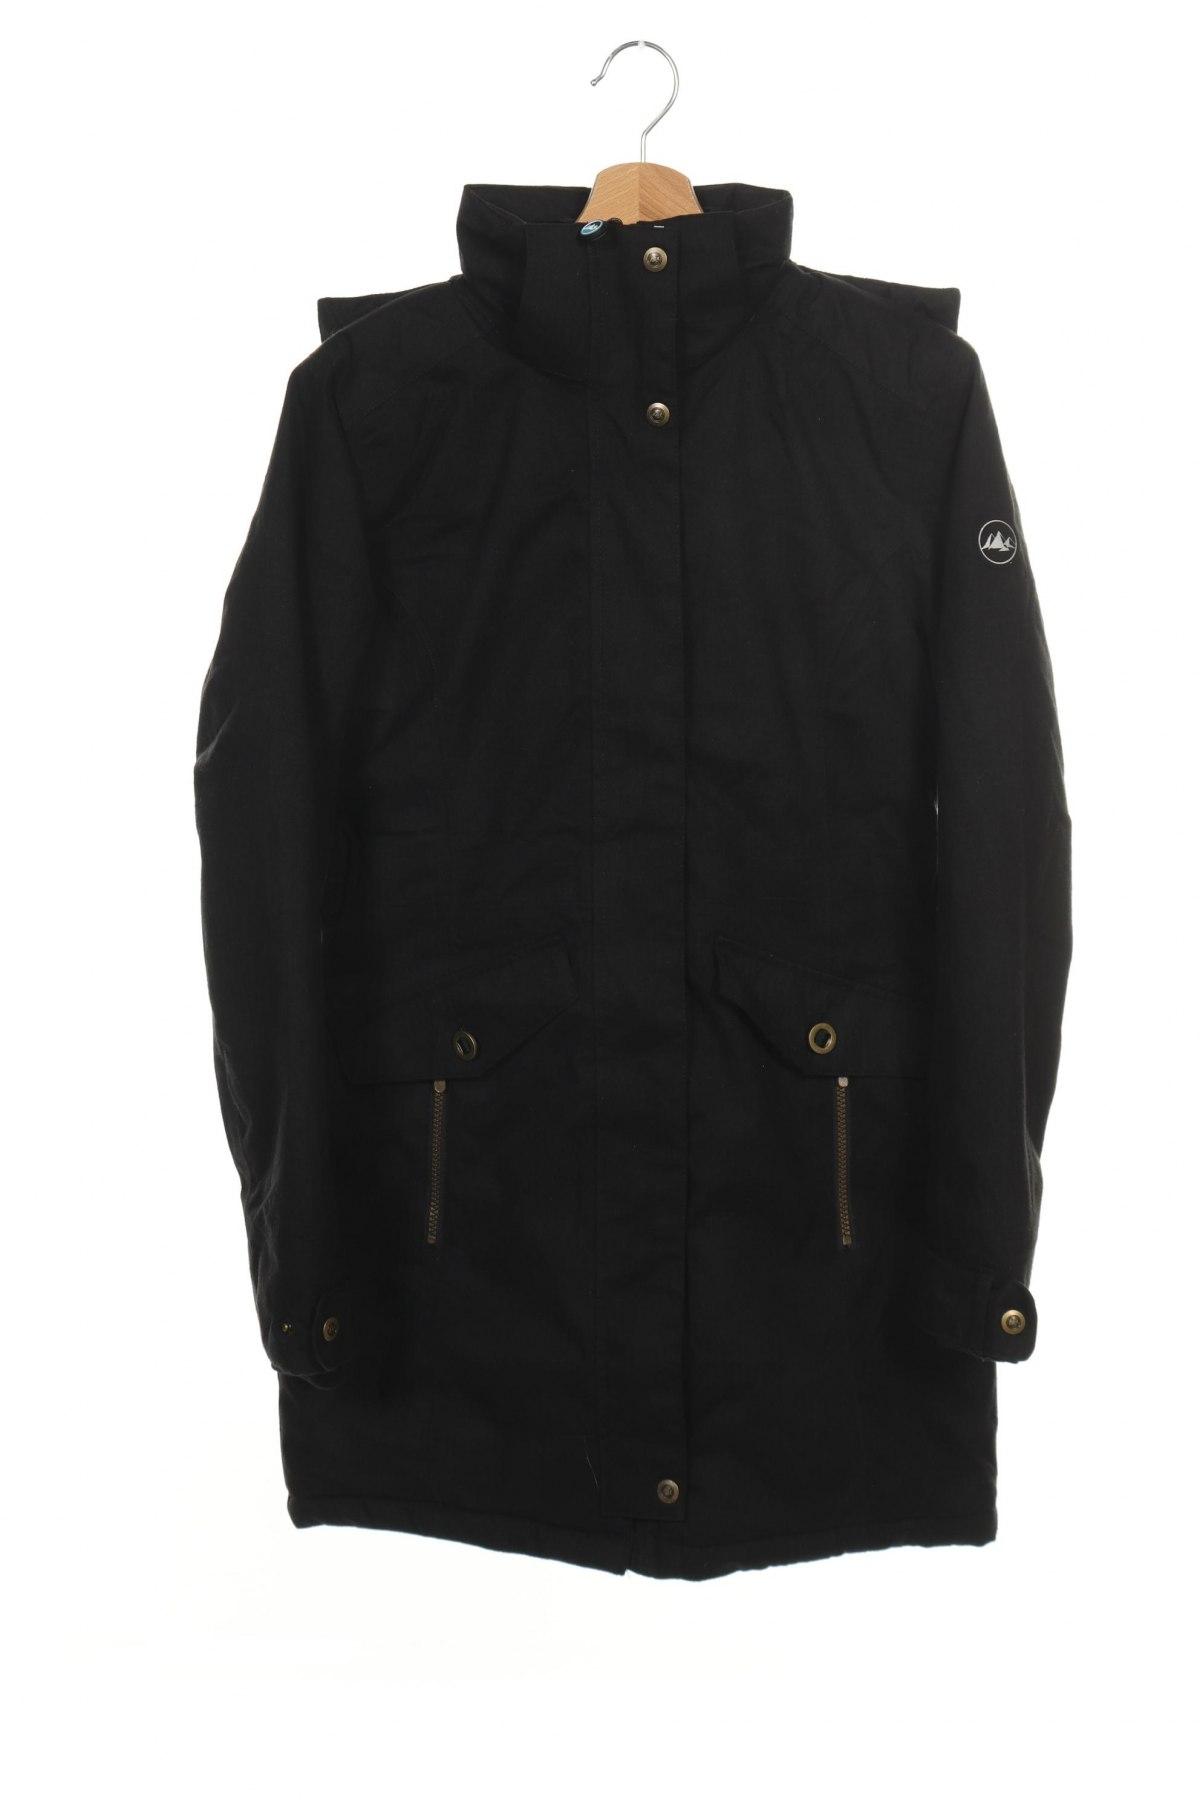 Дамско яке Polarino, Размер XS, Цвят Черен, Полиестер, Цена 141,75лв.